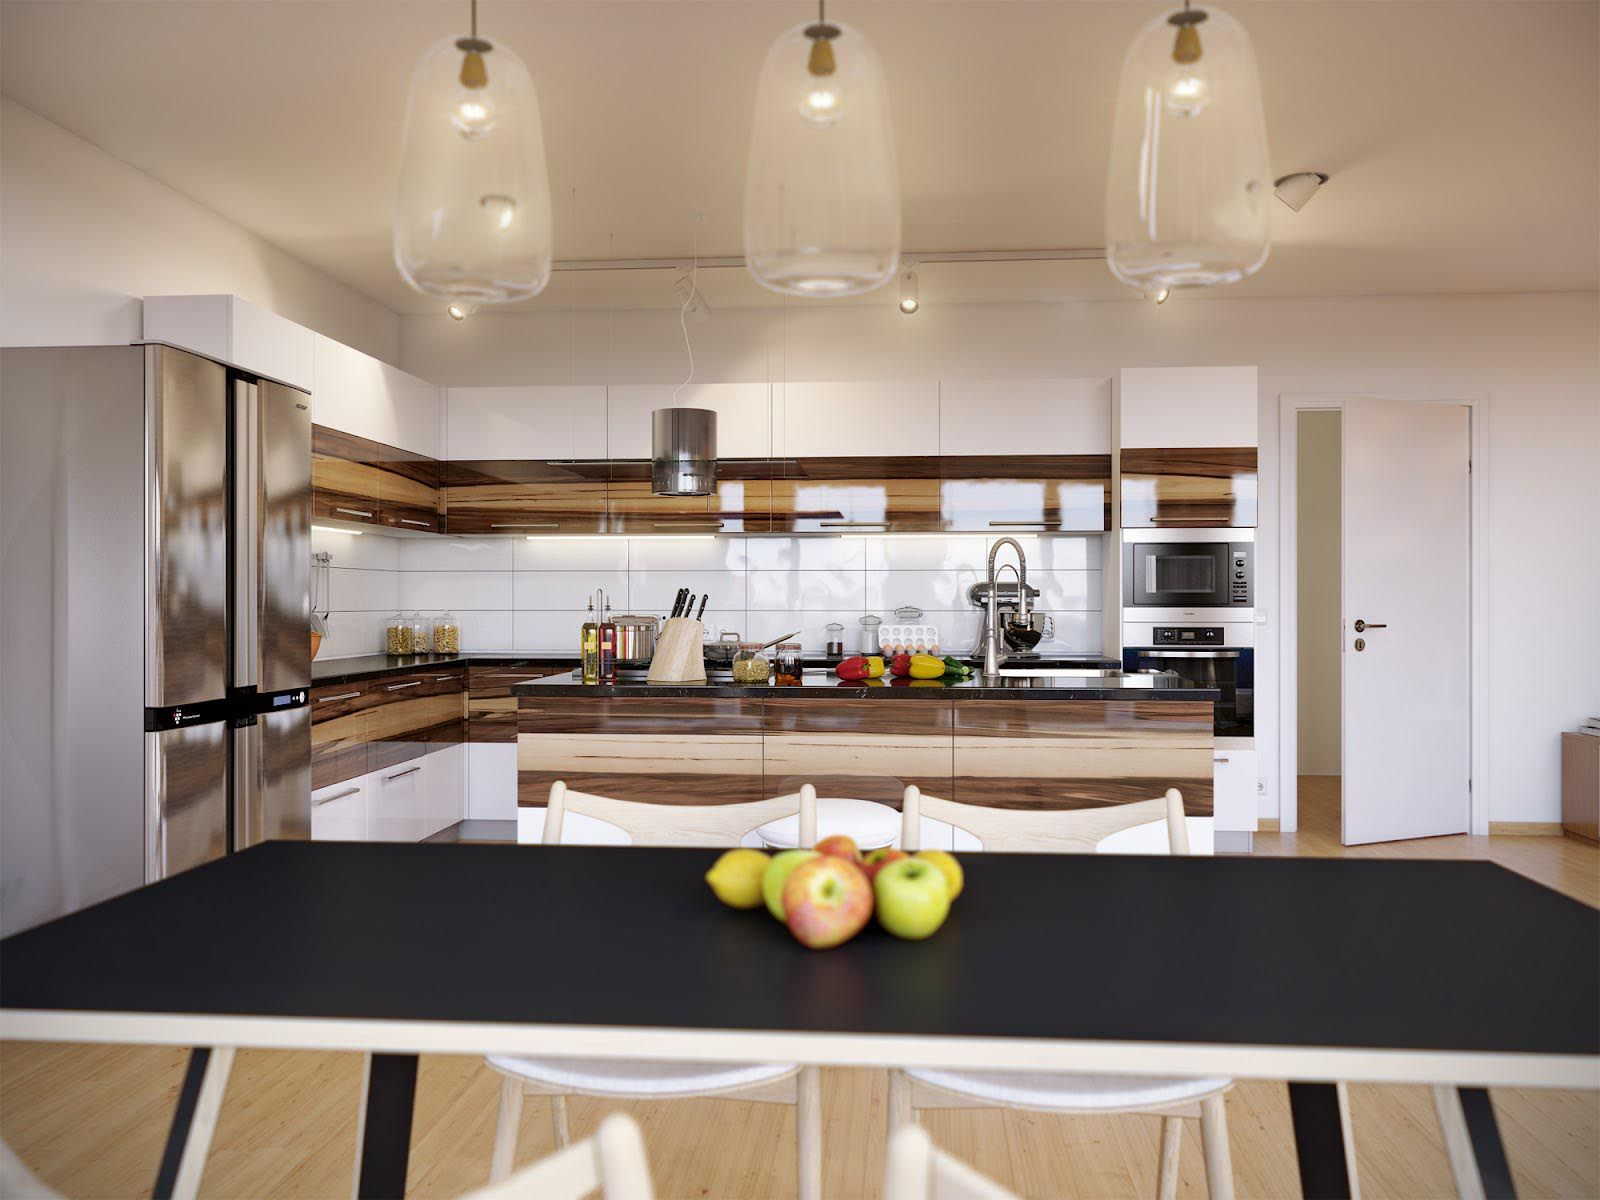 brown and white kitchen designs. Brown and White Kitchen Cabinets Design Ideas